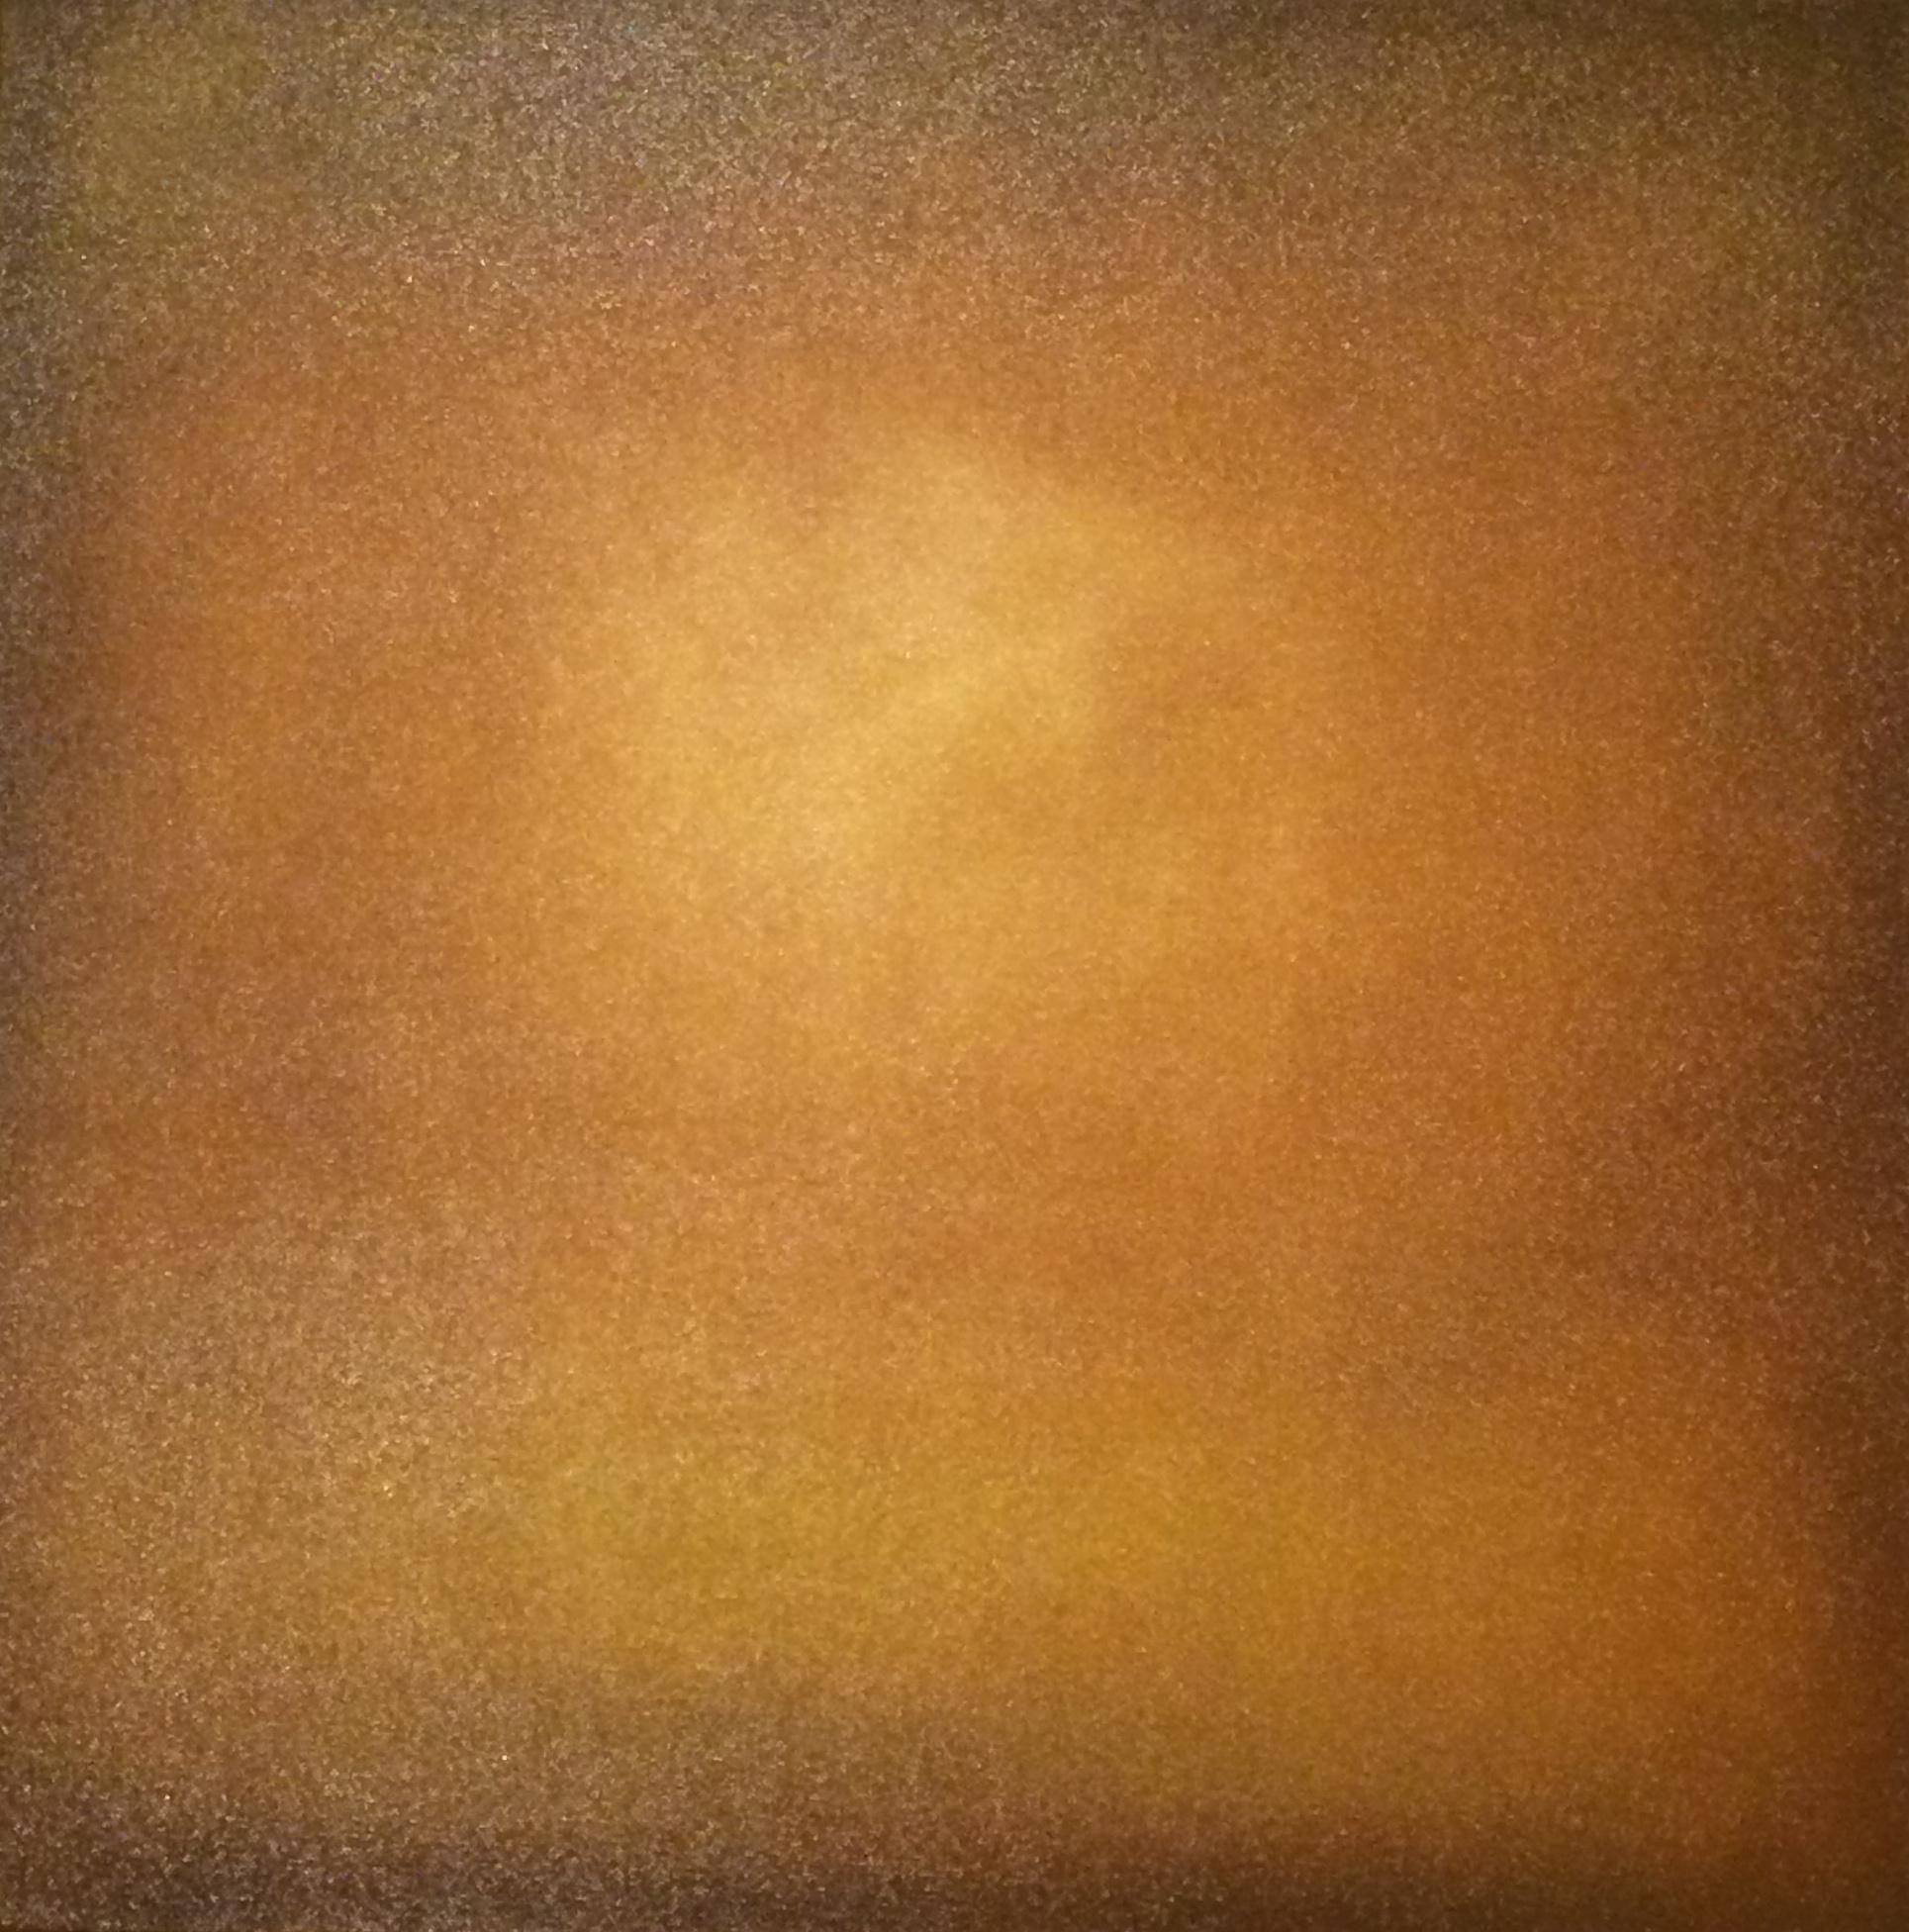 brown_tan_yellow.jpg